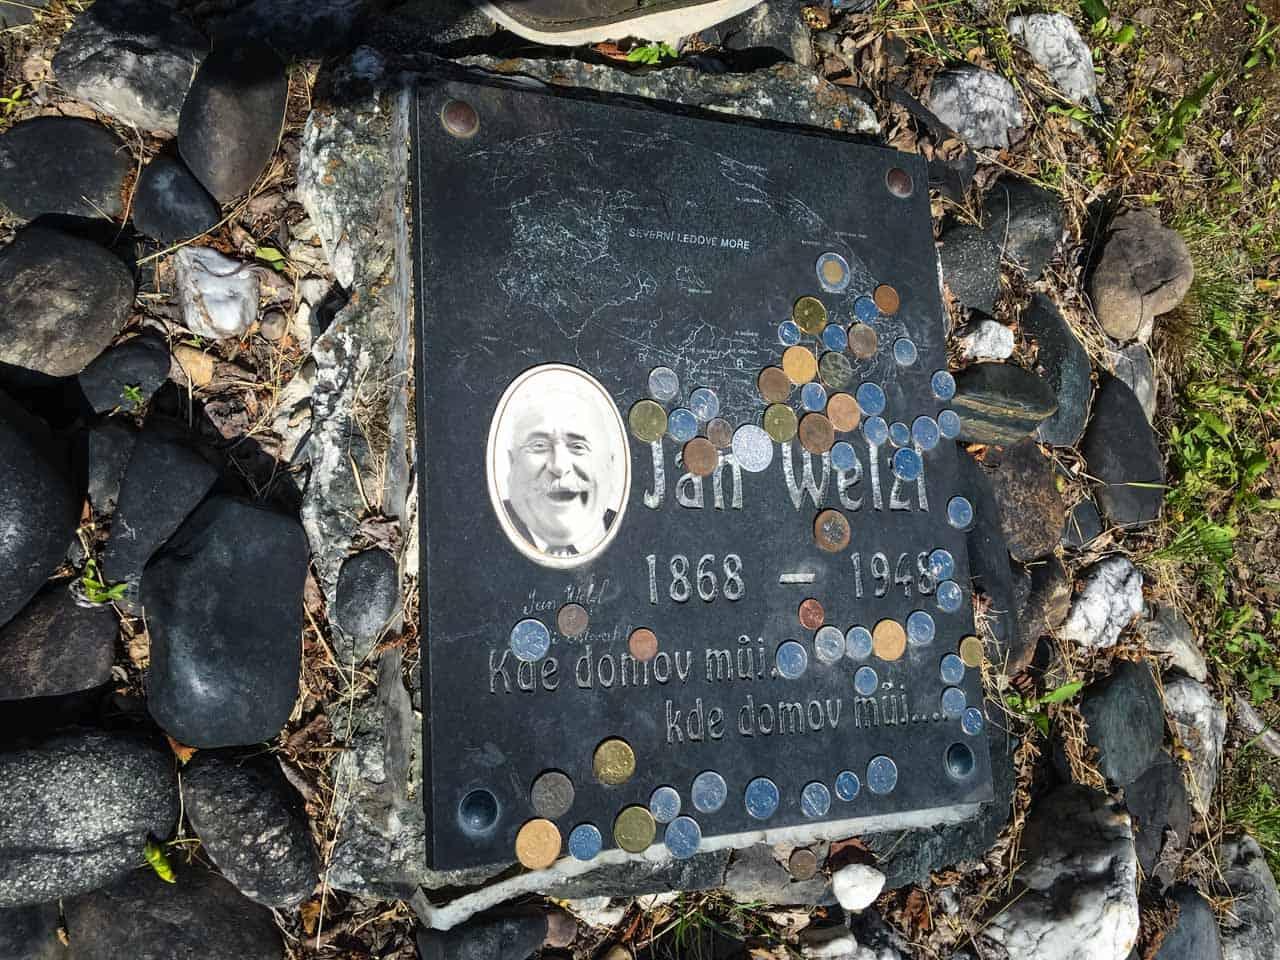 gold rush cemetery dawson city grave of Jan Wetzl